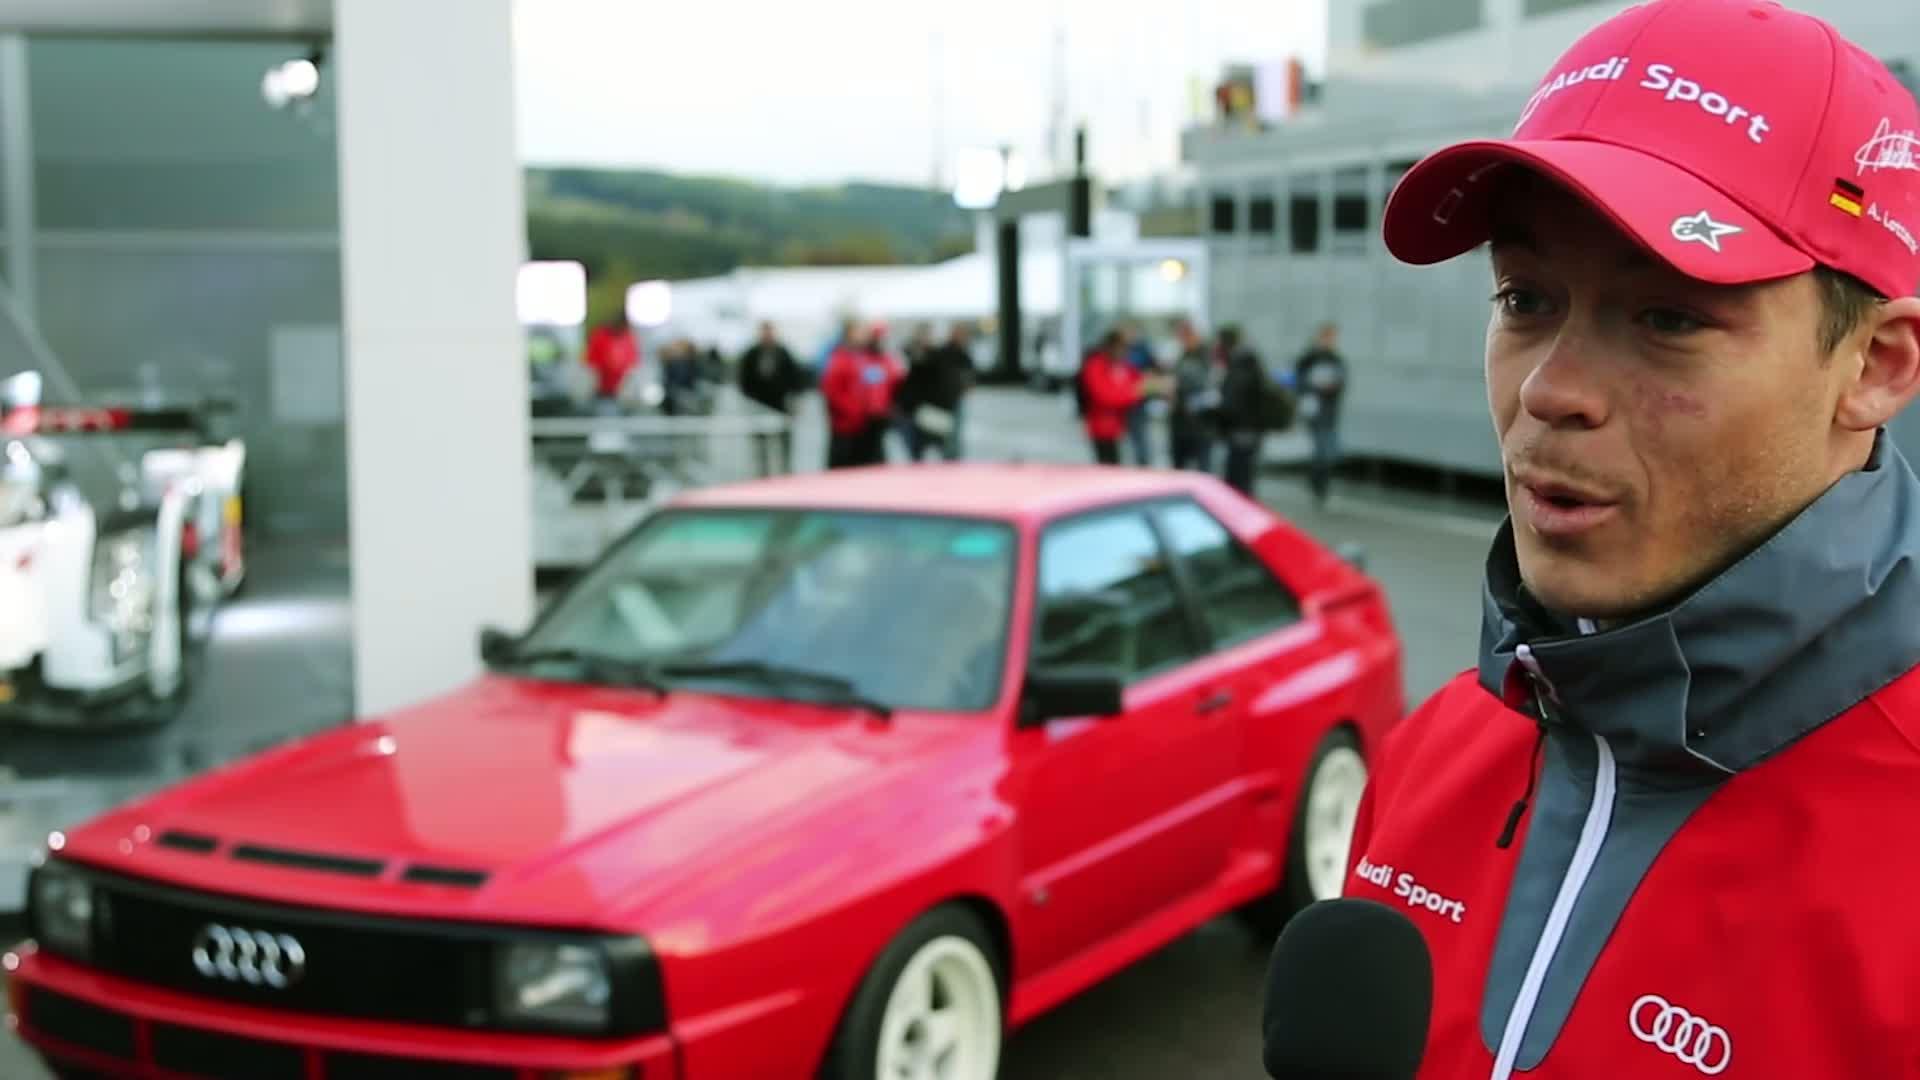 60 Seconds of Audi Sport 13/2015 - André Lotterer